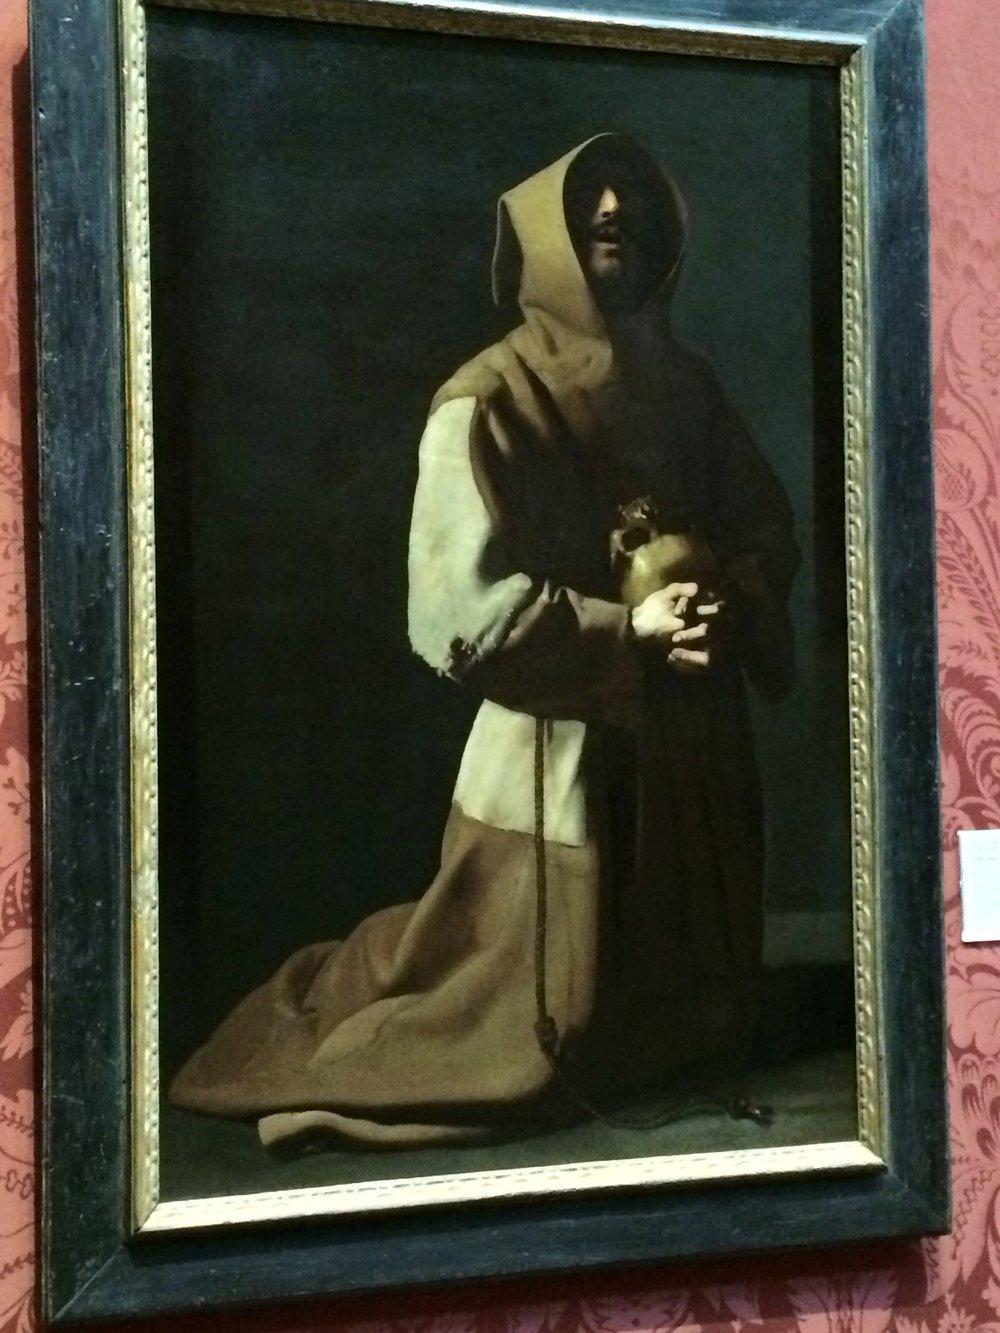 A favorite painter - Zurbran's St. Francis